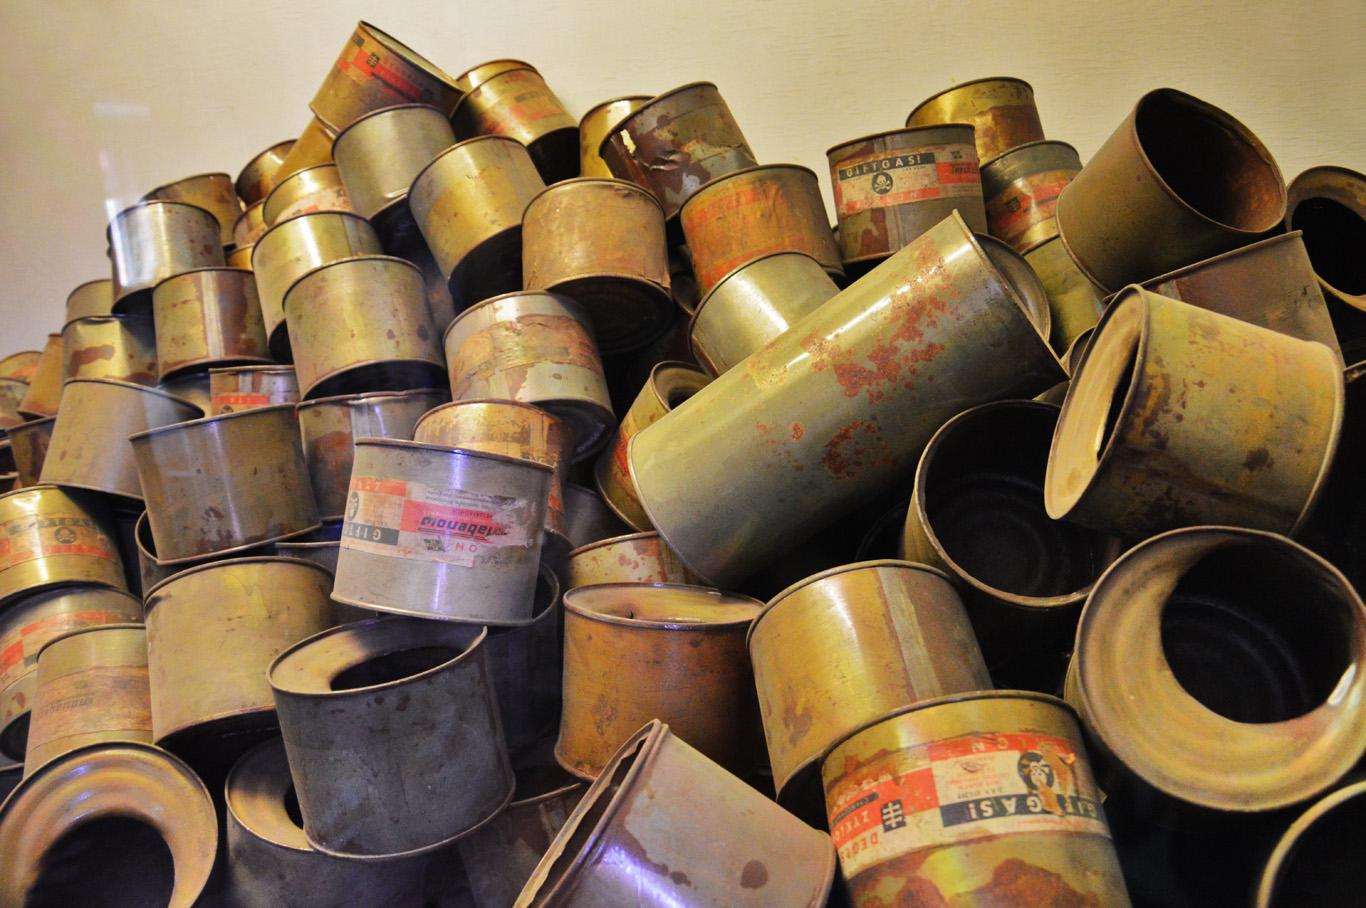 Original Zyklon B cans